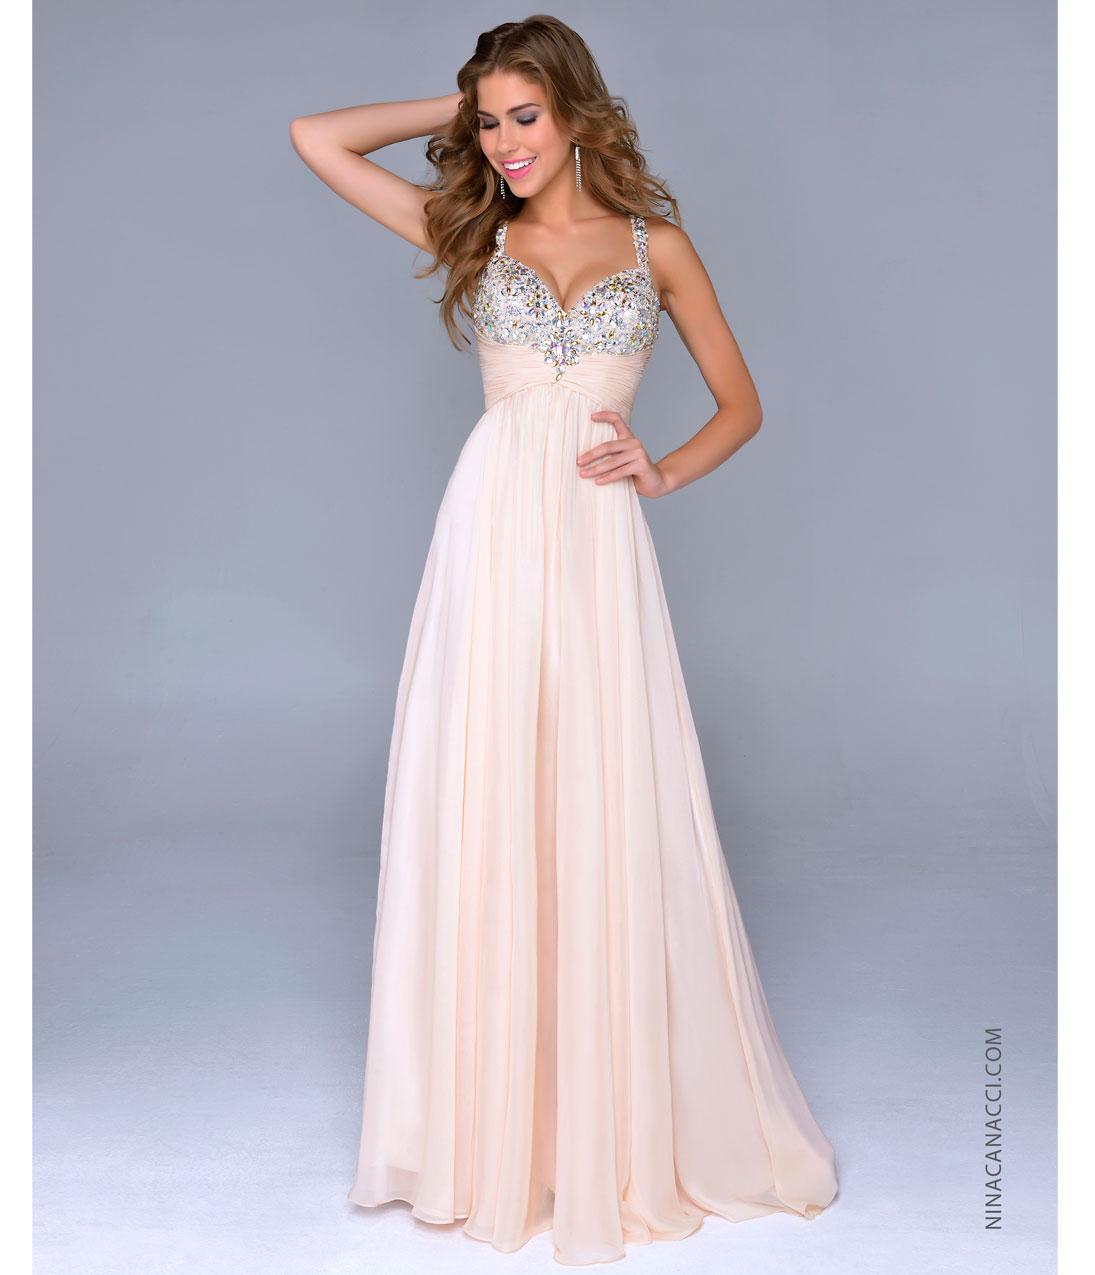 Nina Canacci 2014 Prom Dresses - Nude Chiffon & Beaded Bodice Prom Gown - Unique Vintage - Prom dresses, retro dresses, retro swimsuits.